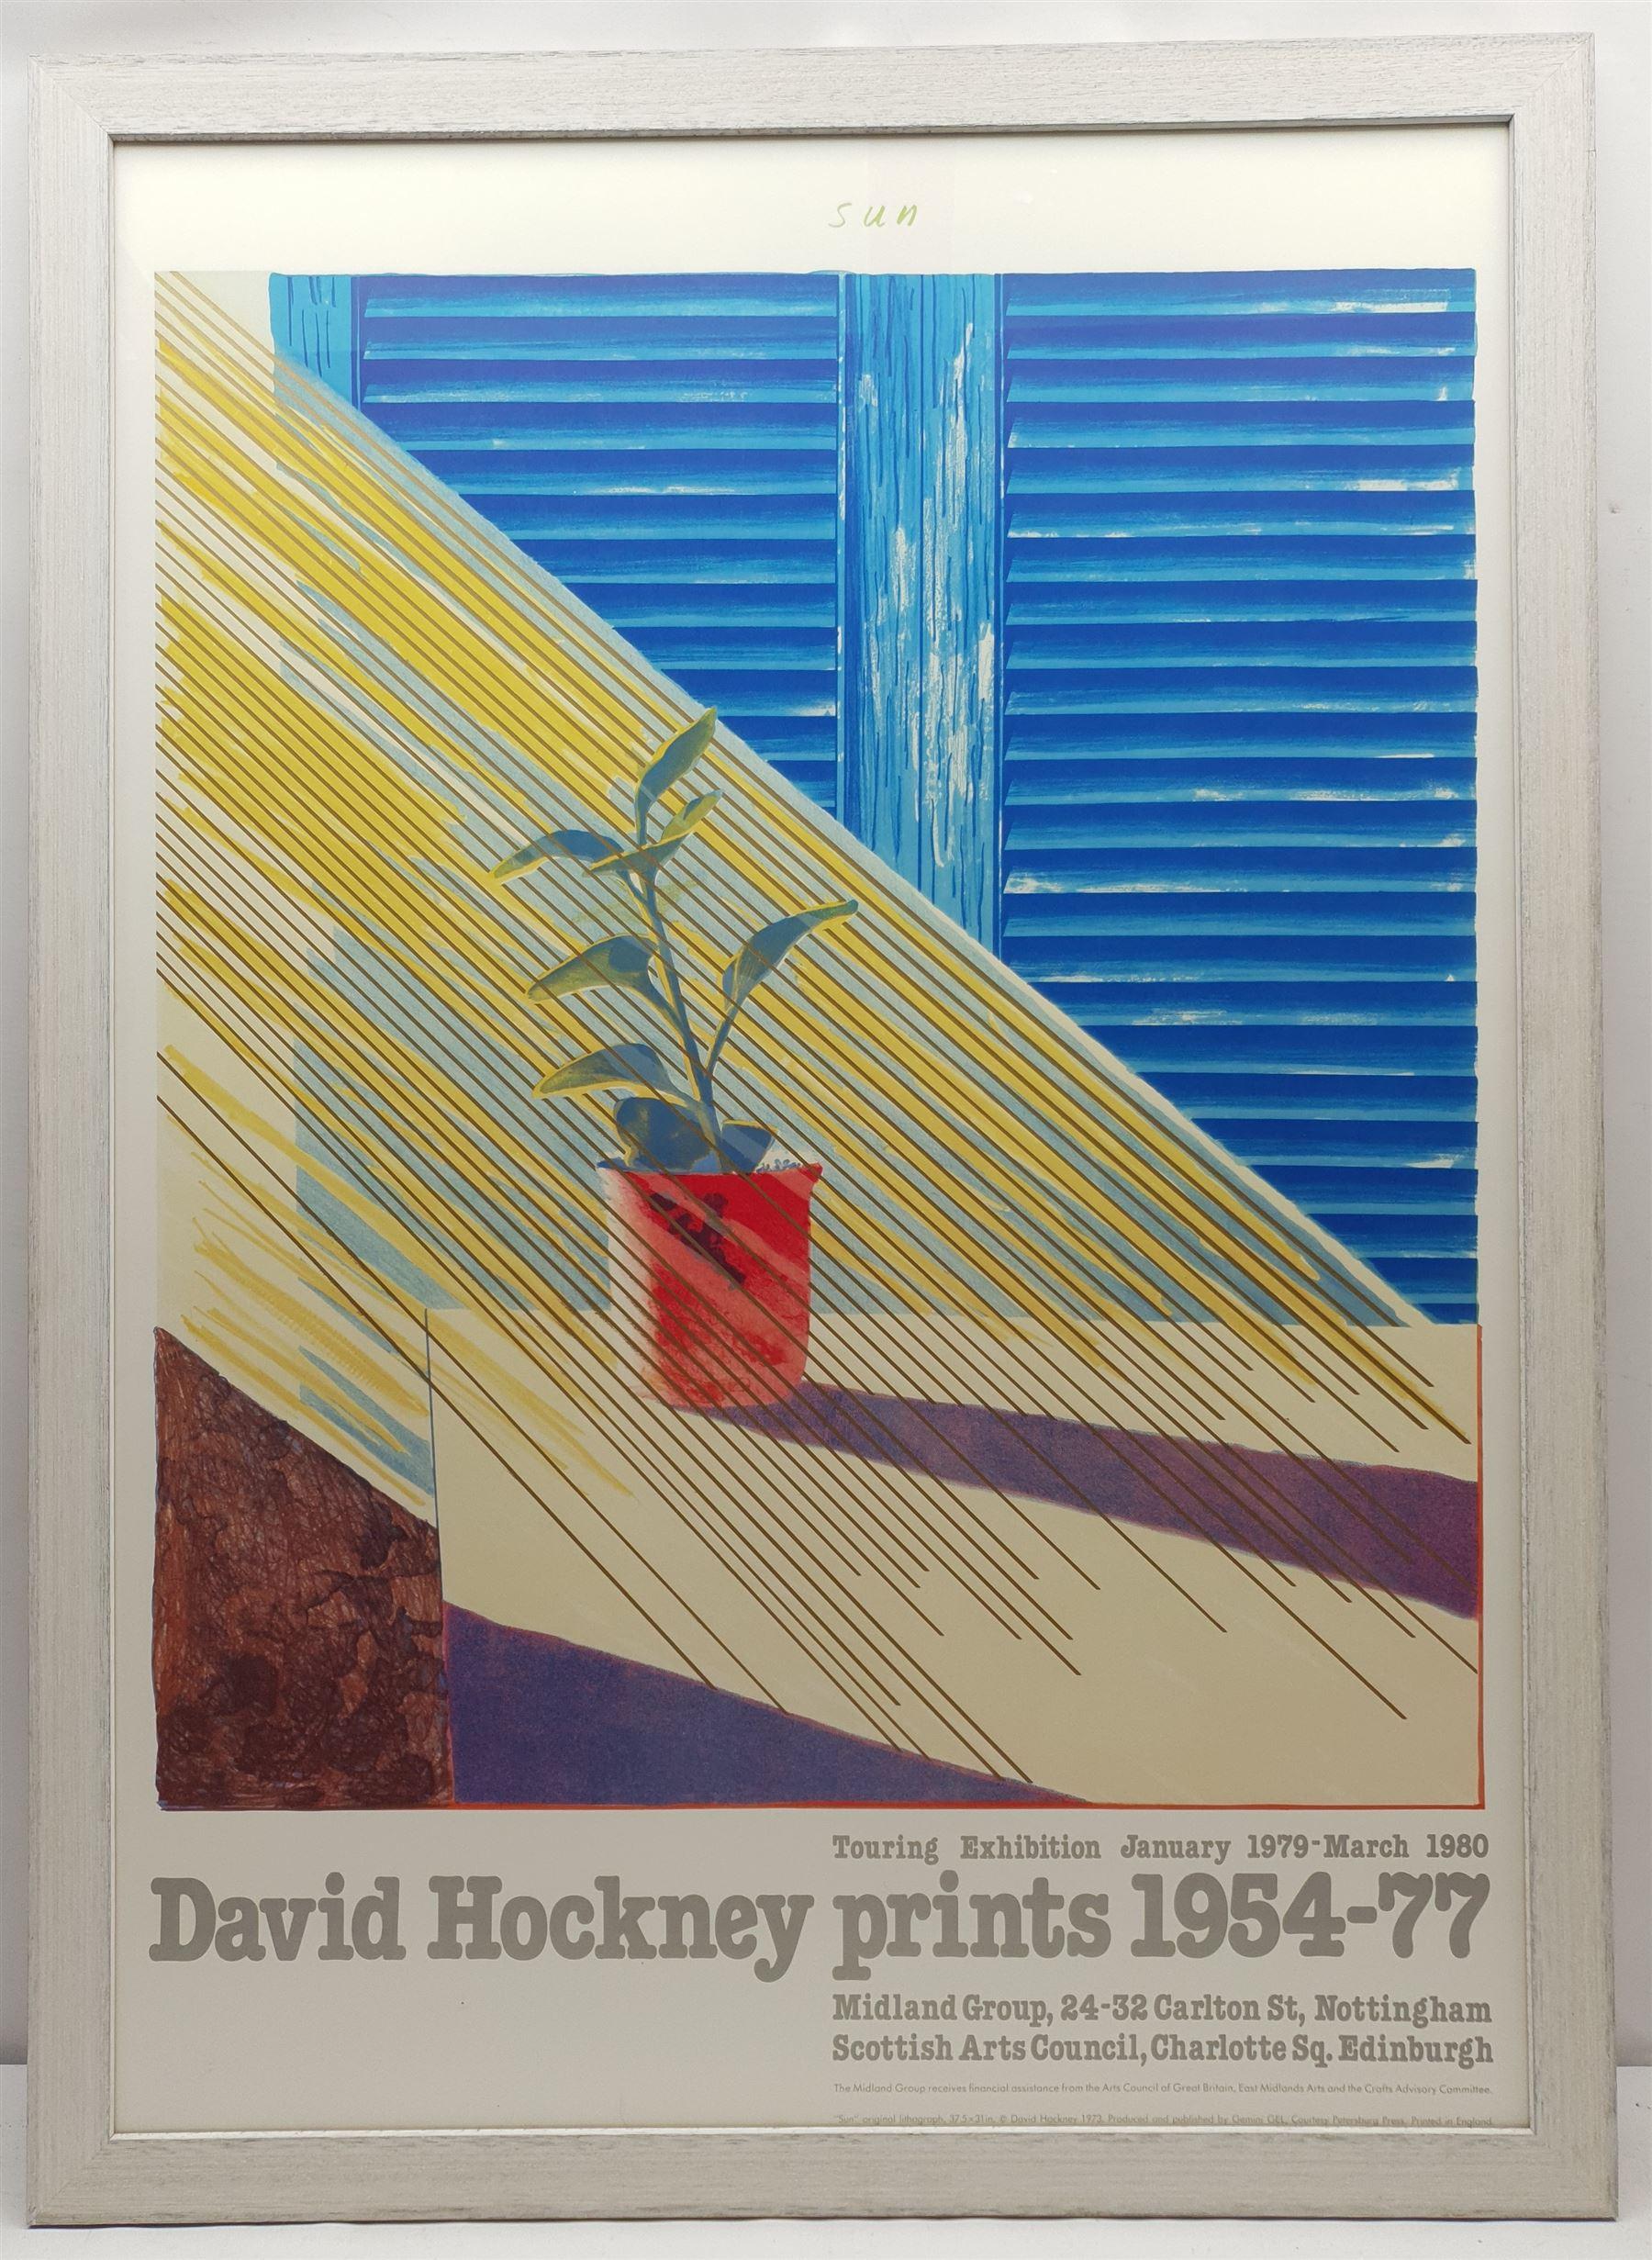 After David Hockney (British 1937-): 'Sun - David Hockney prints 1954-77' - Image 2 of 2